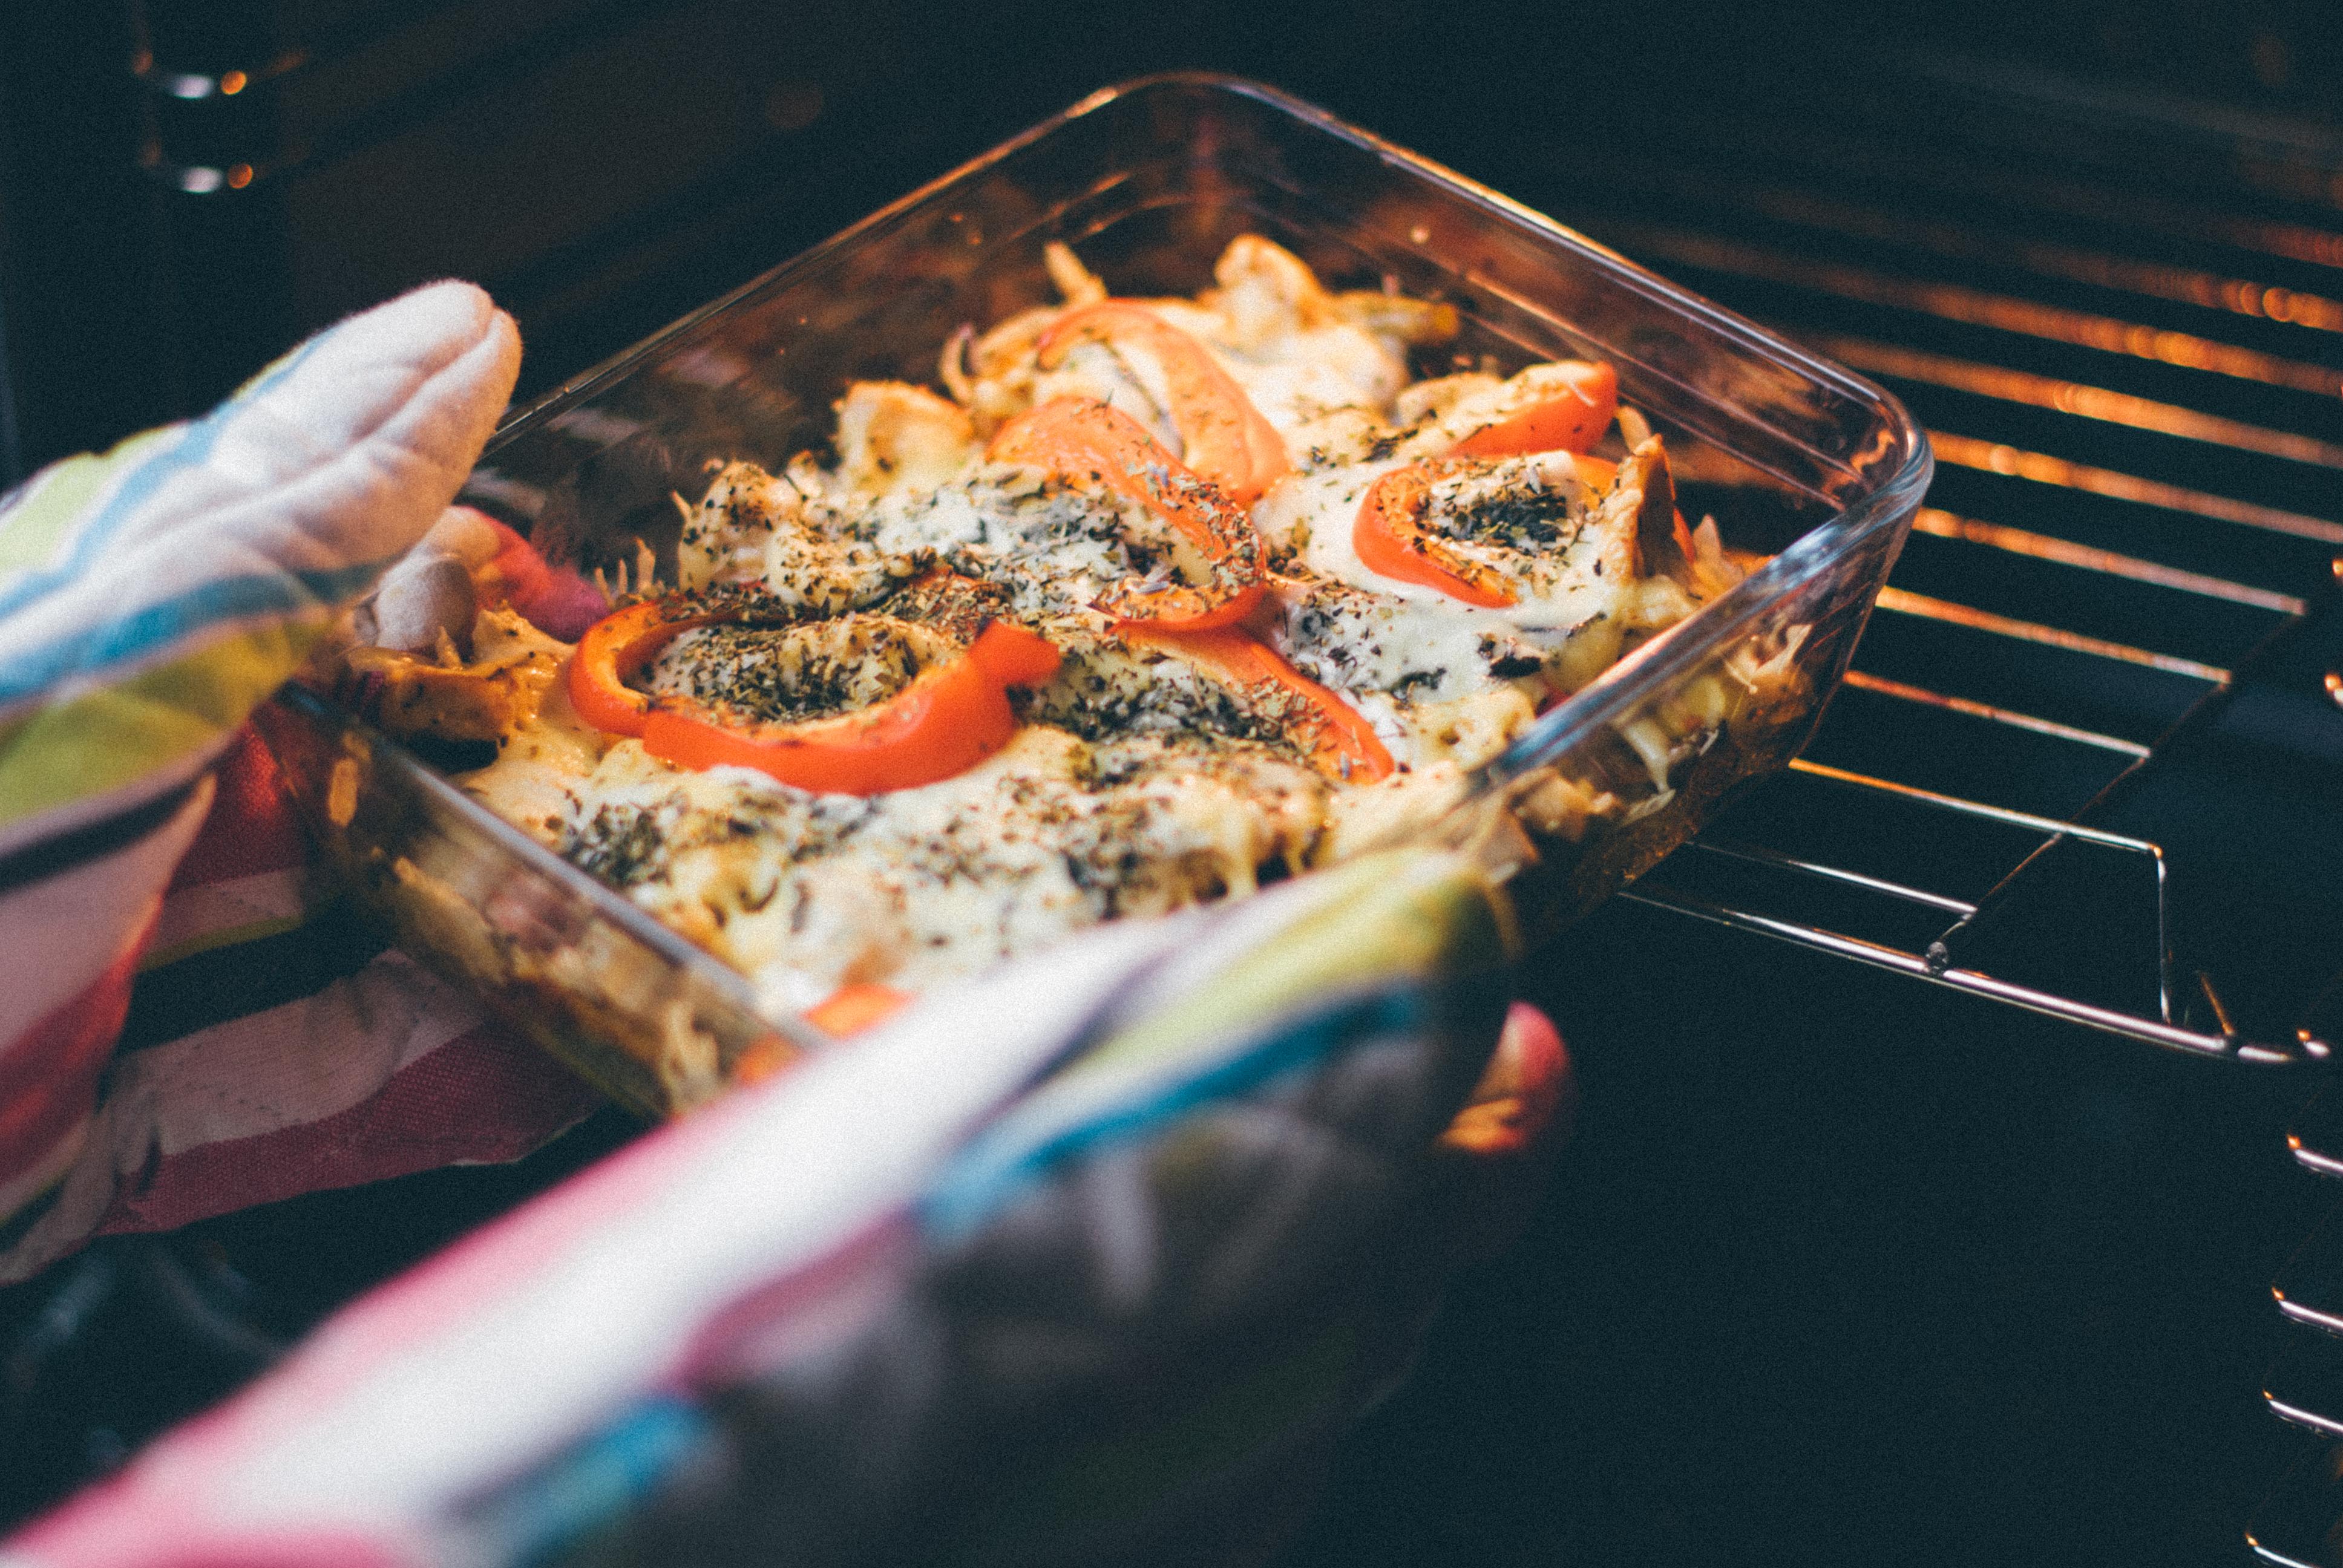 Food, Fresh, Heat, Hot, Oven, HQ Photo